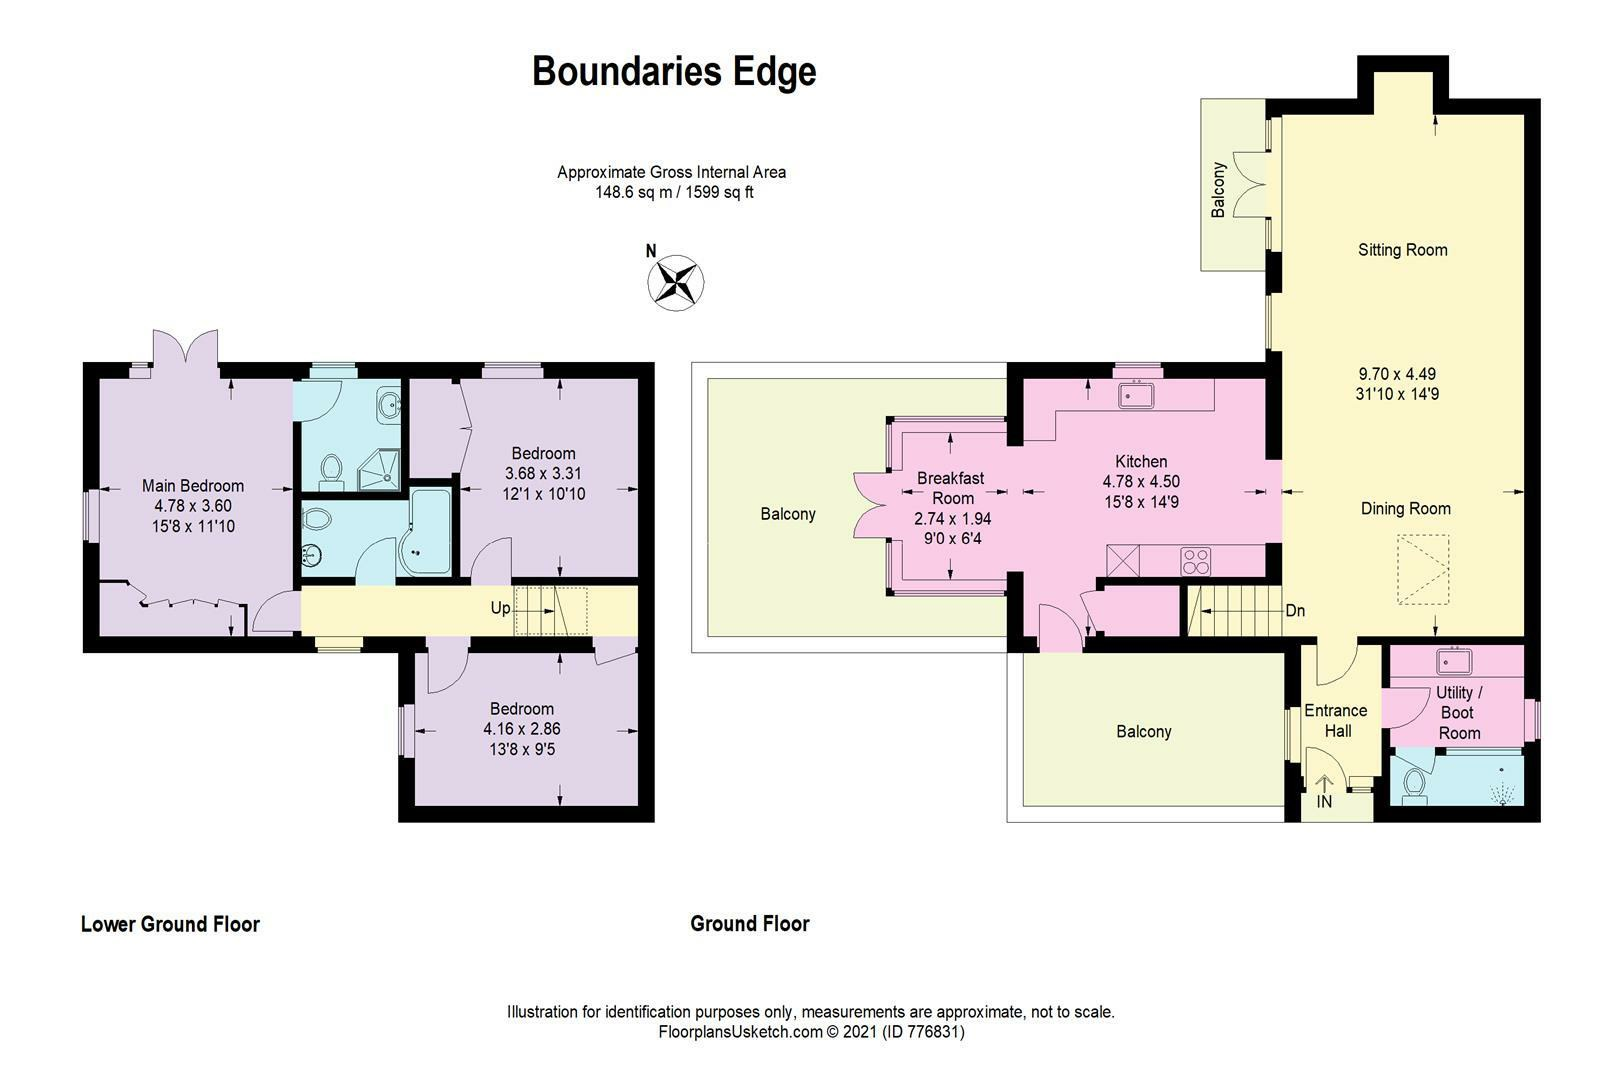 Boundaries Edge brochure